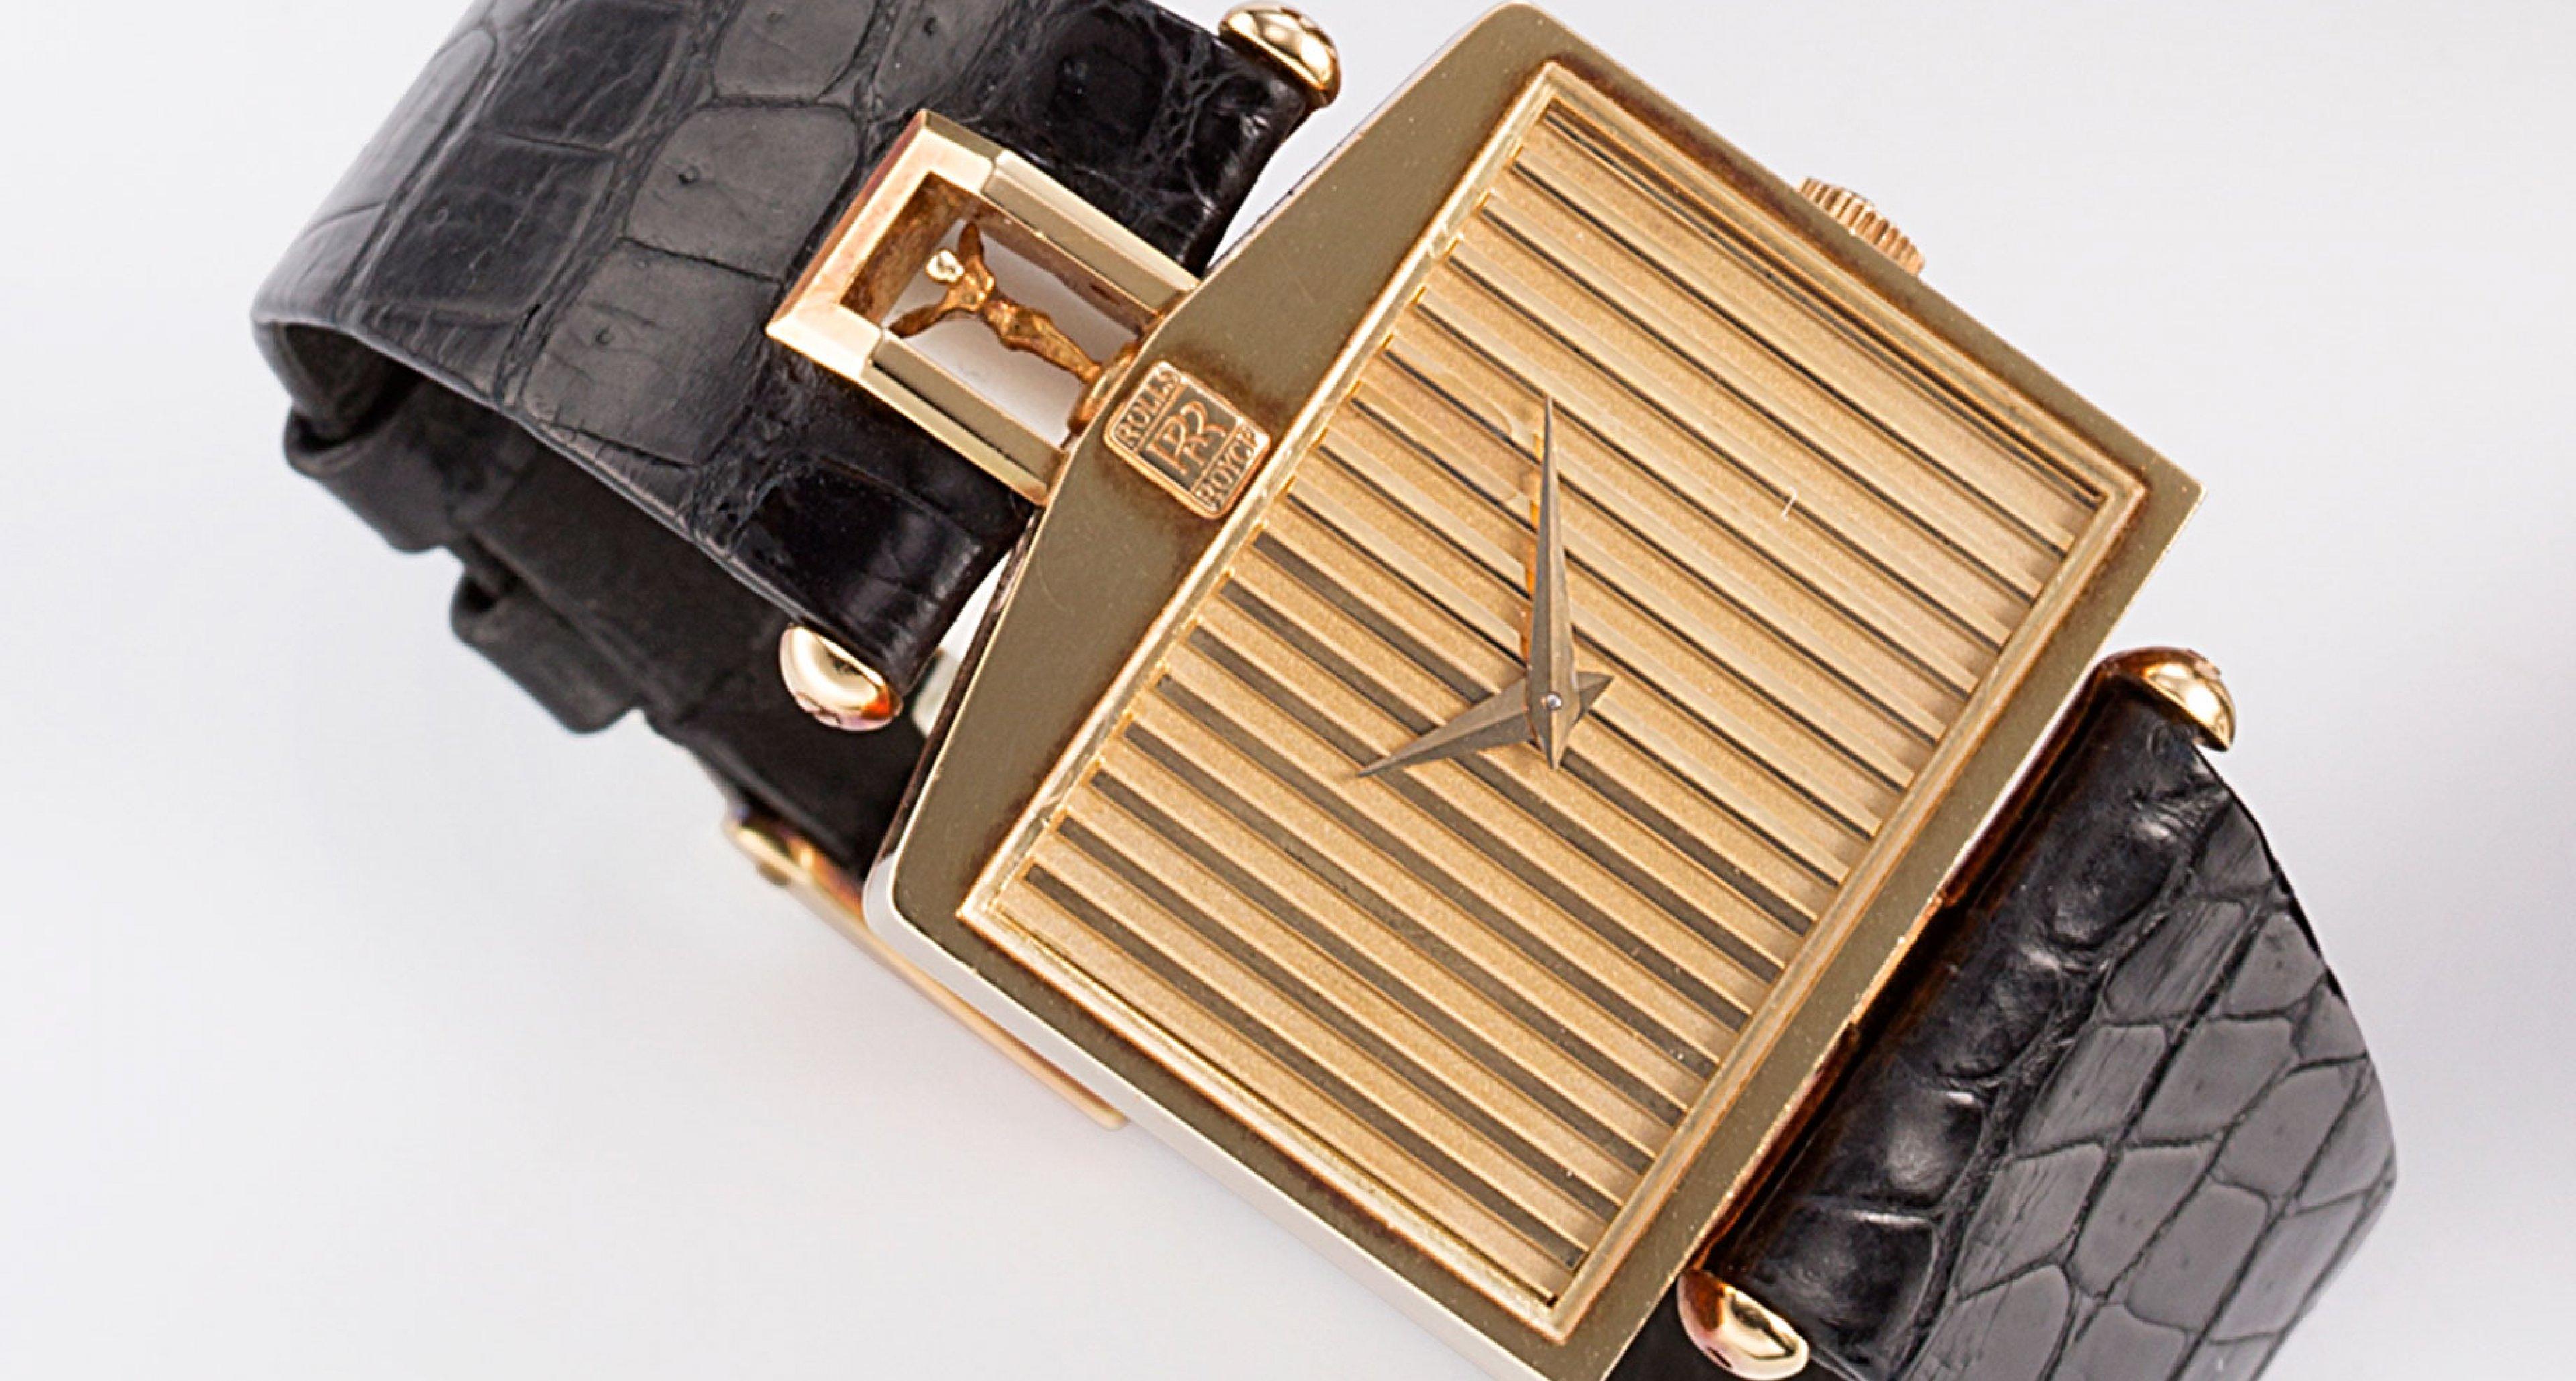 The Corum golden watch inspired by Rolls-Royce